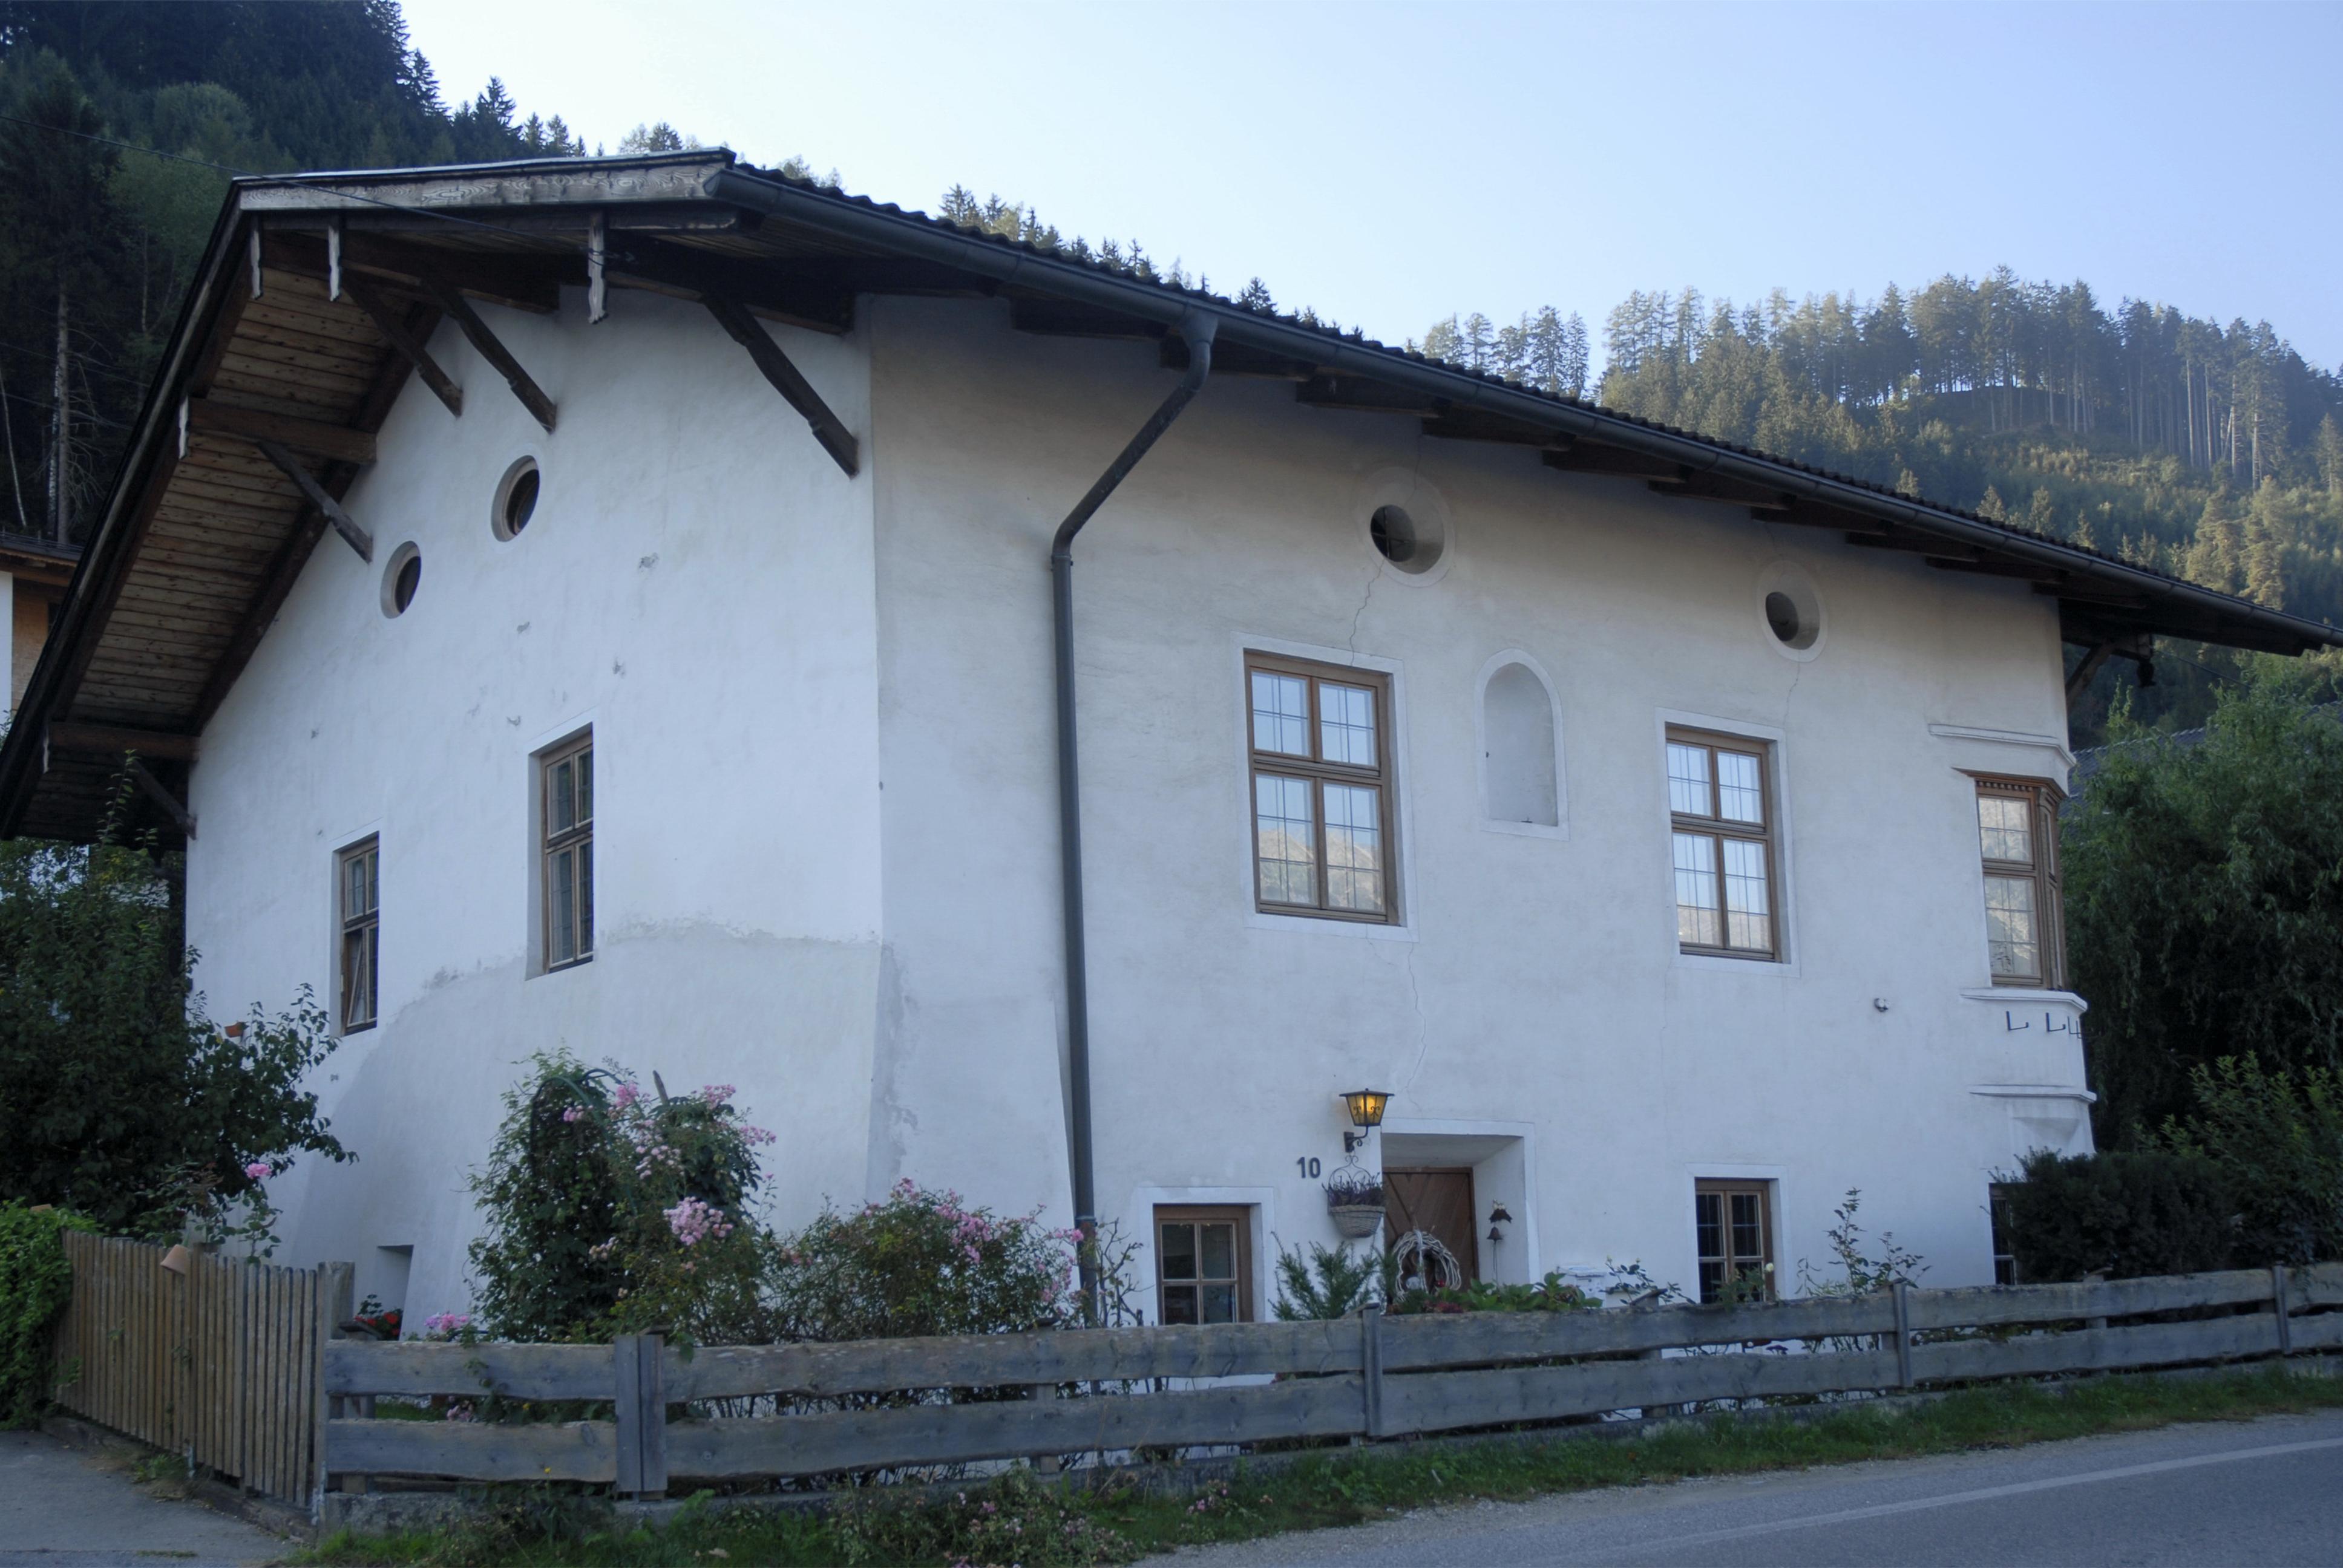 File:Ampass, Haus Häusern 10.JPG - Wikimedia Commons